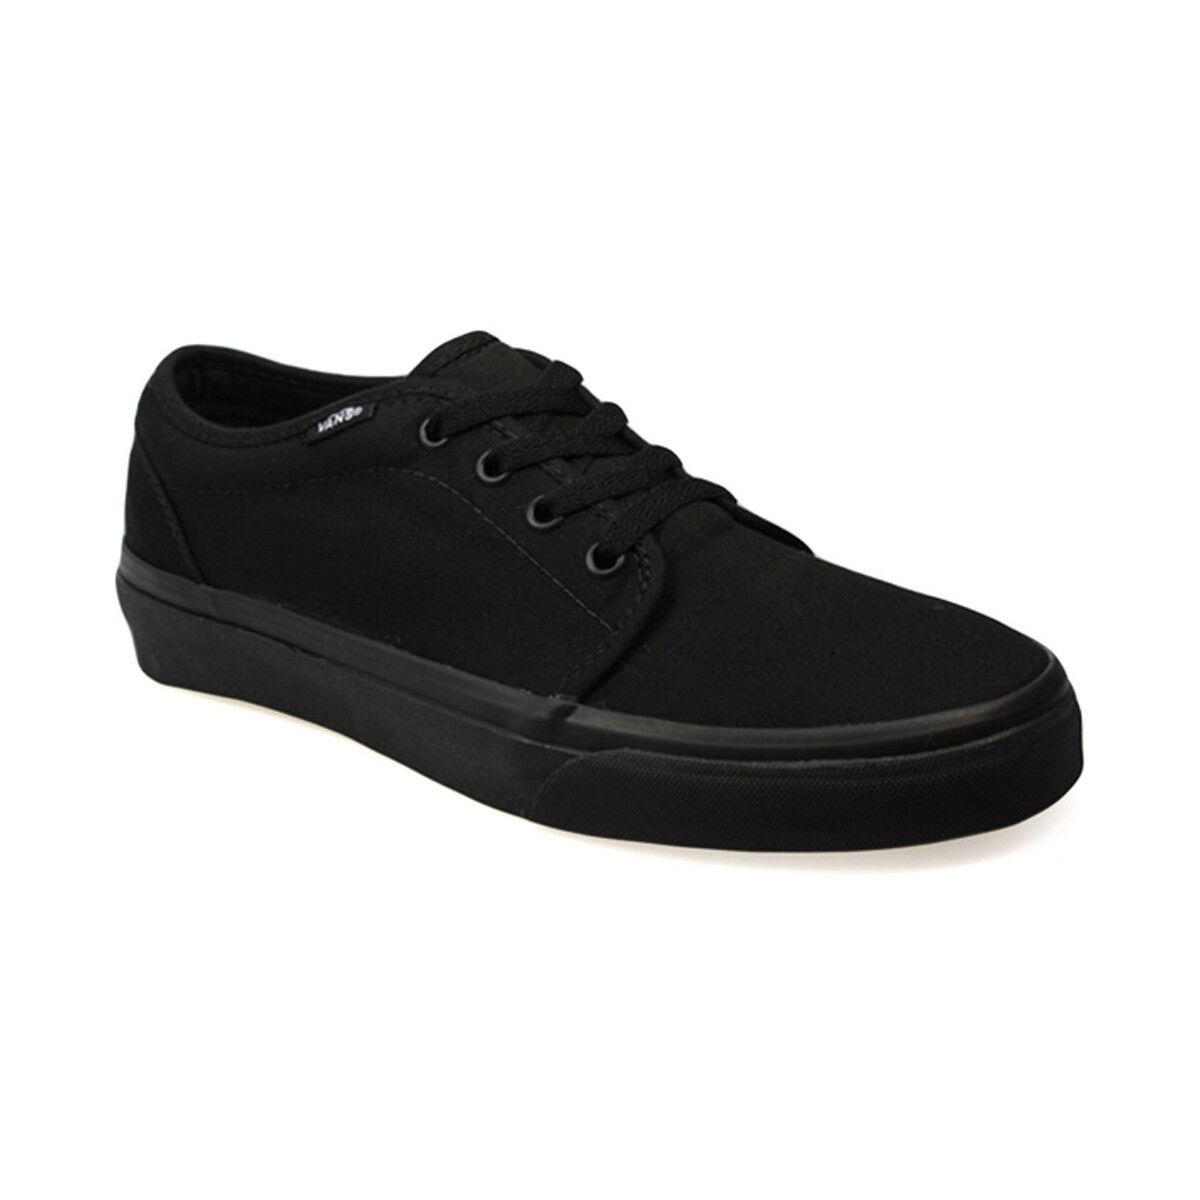 Vans 106 Vulcanized Black Black Mens Shoes Sneakers VN-099ZBL